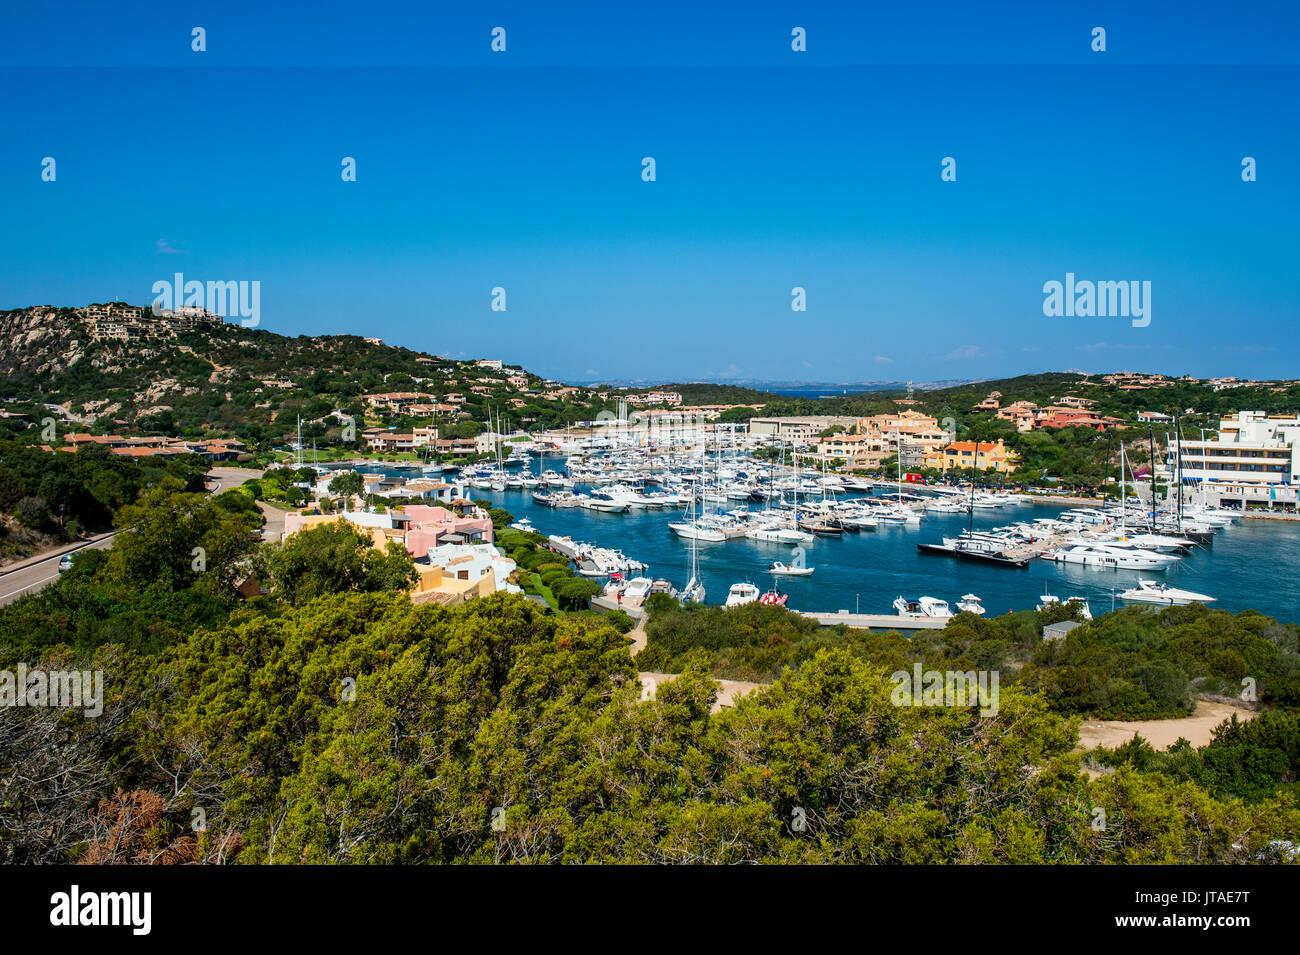 The bay of Porto Cervo, Costa Smeralda, Sardinia, Italy, Mediterranean, Europe - Stock Image